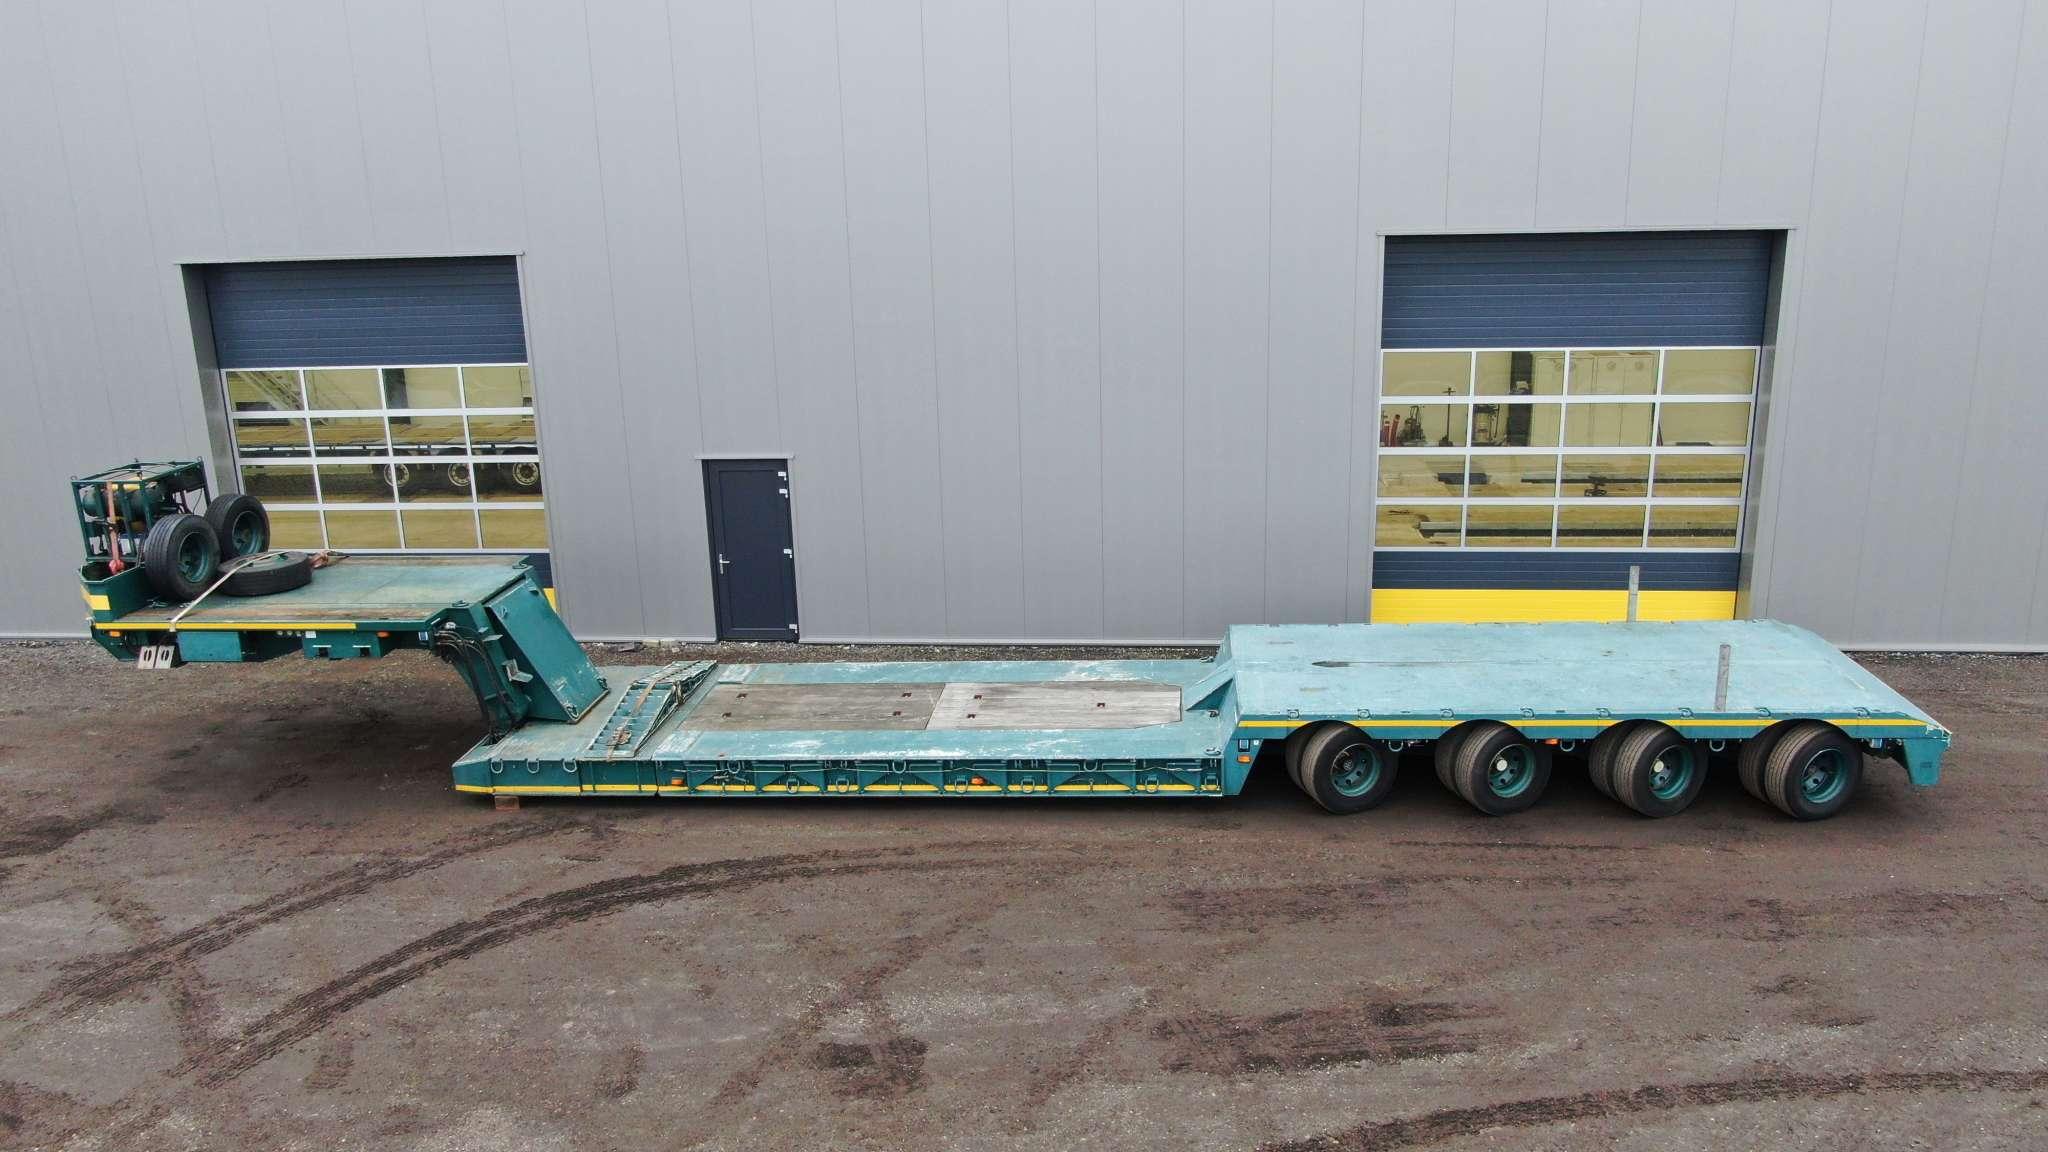 Cama baja de 4 ejes | cuello de cisne desmontable | extensible hasta 9,3 m | carga útil de 65 toneladas